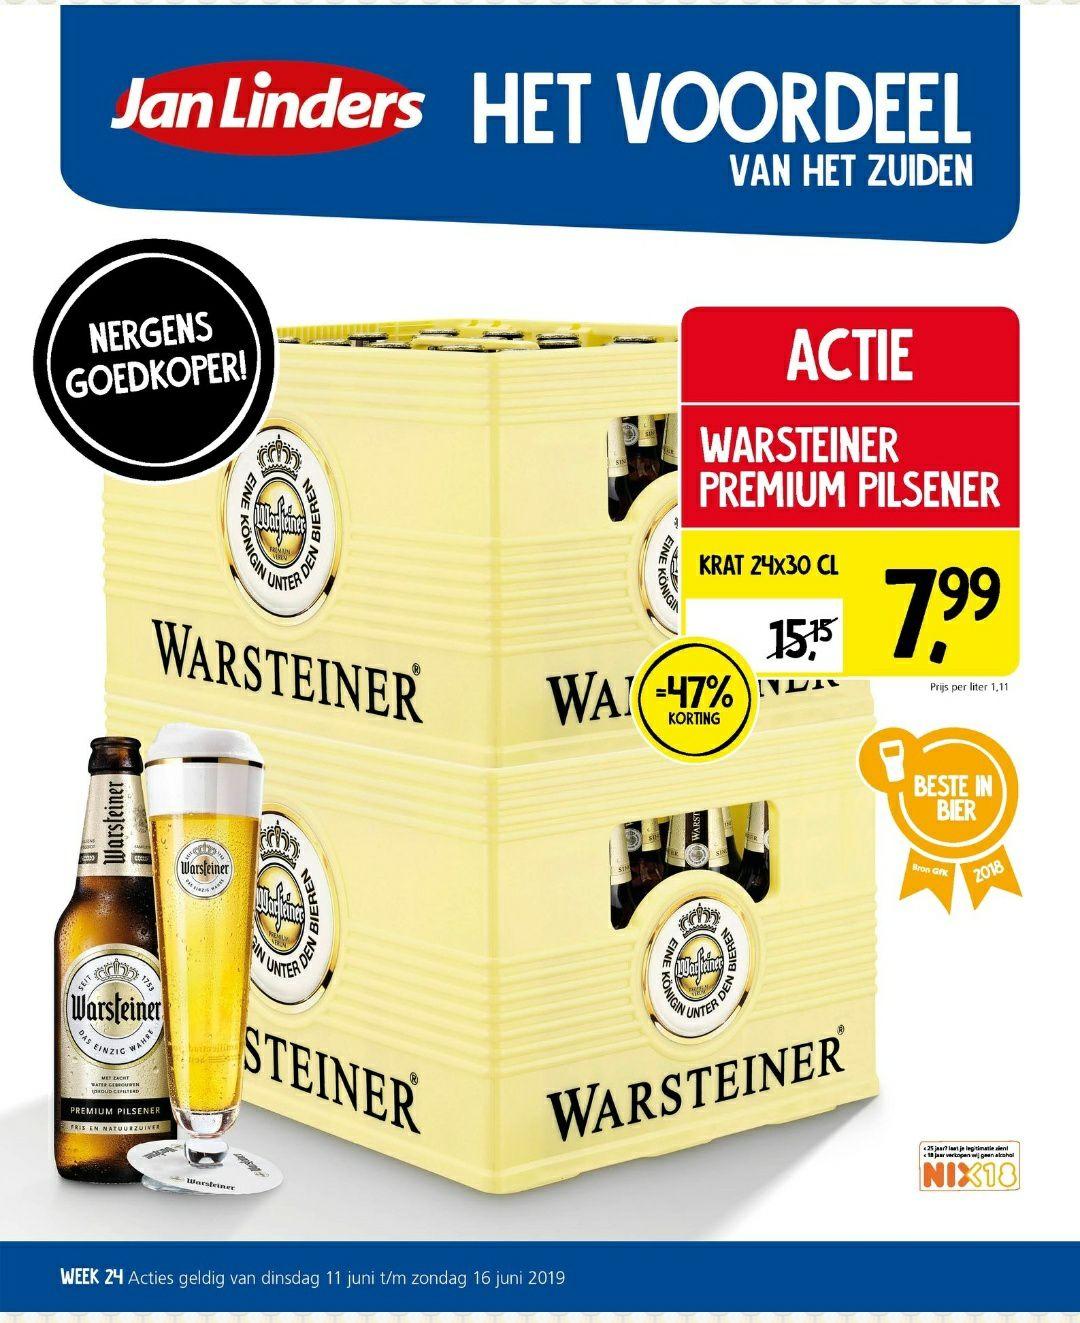 Warsteiner Premium pilsener 24 x 30cl @Jan Linders